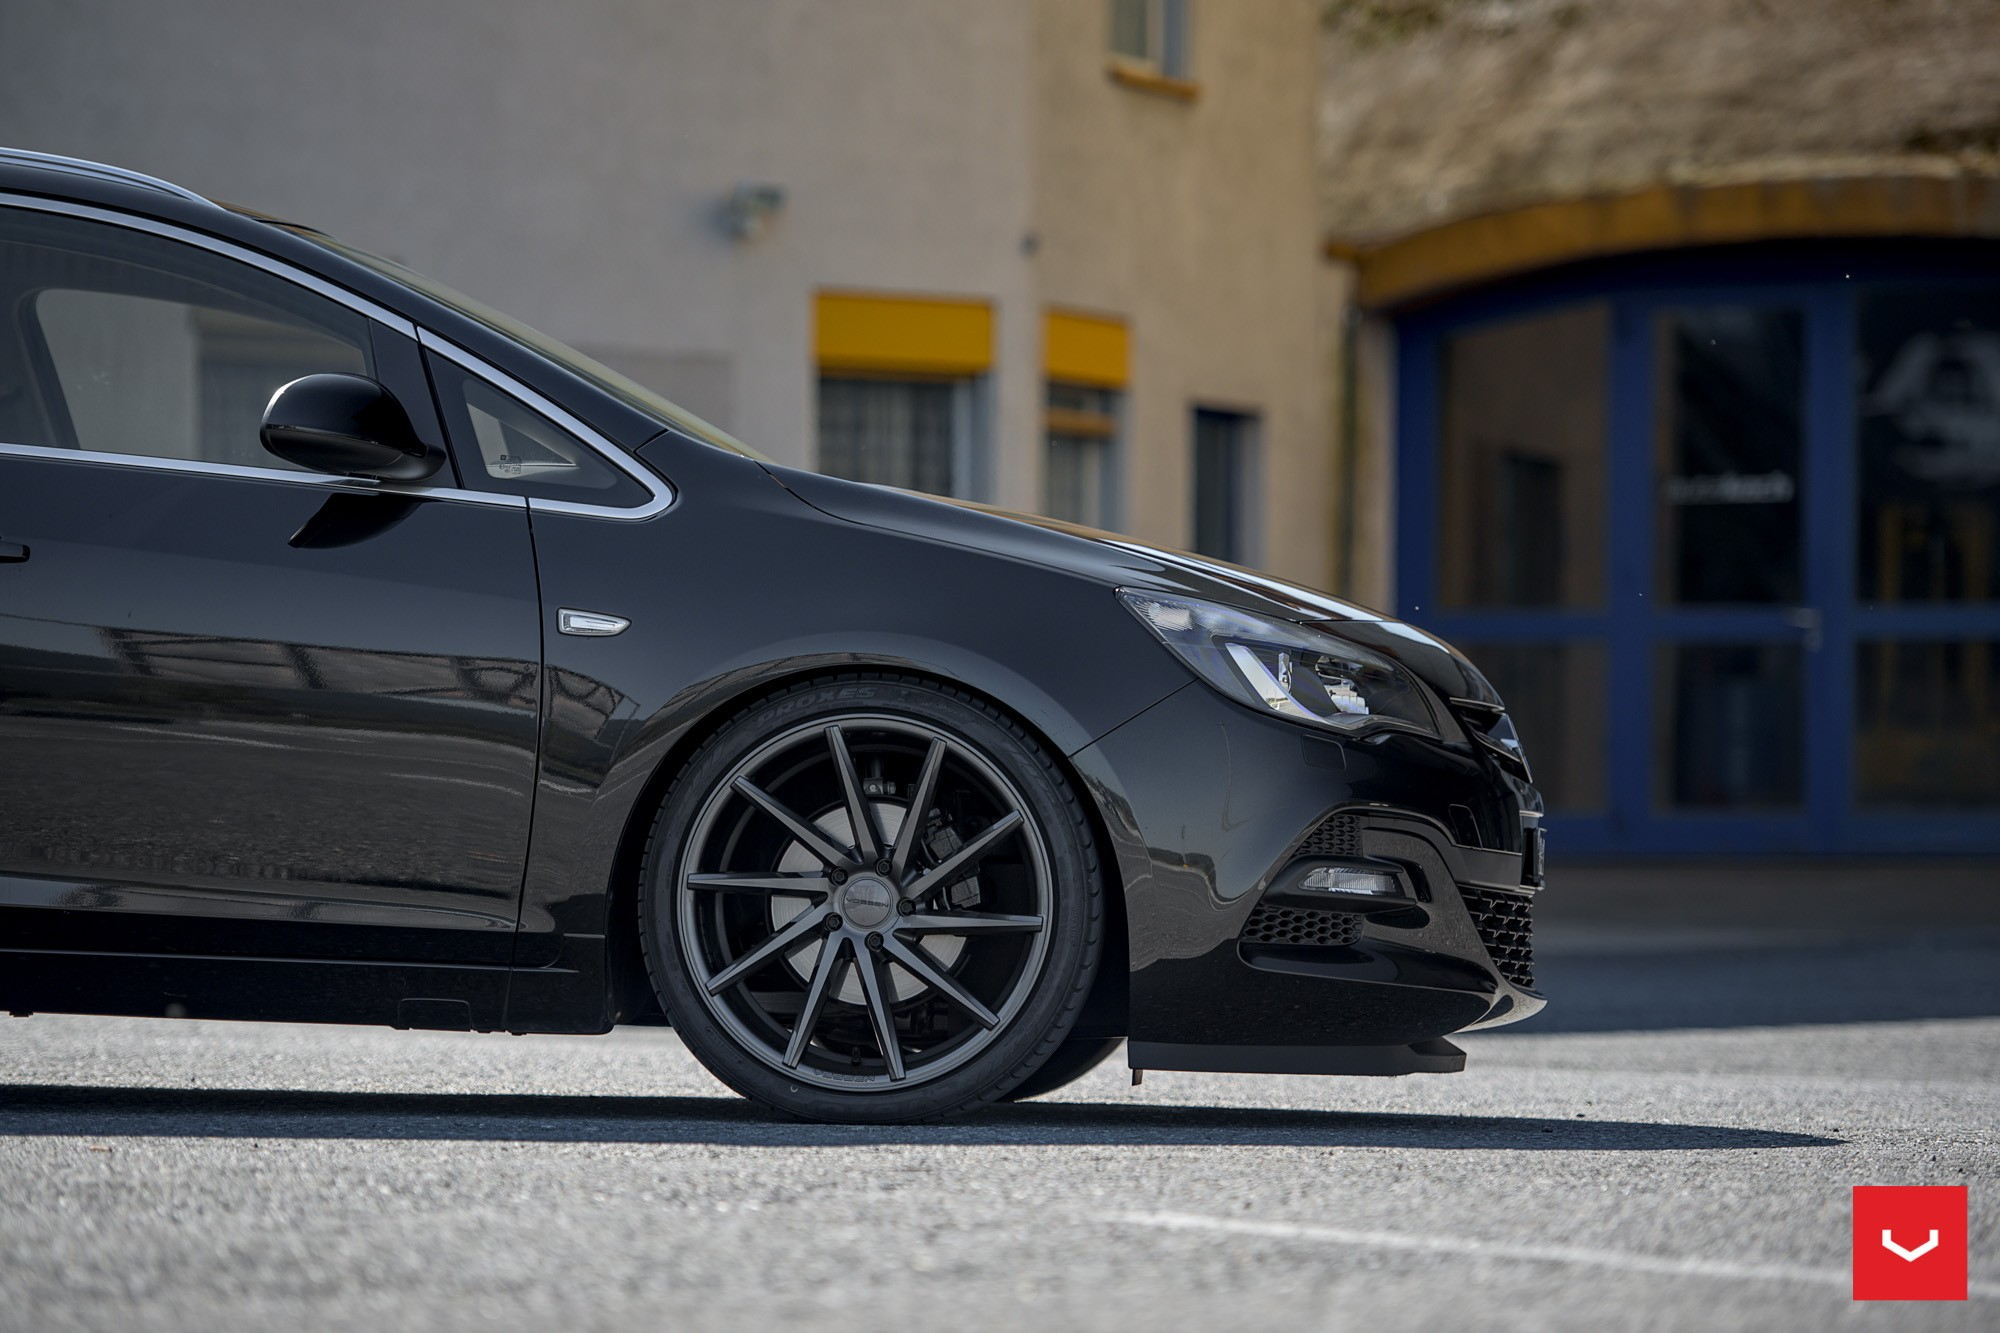 Range Rover Black >> Opel Astra J Wagon Doubles Its Value With Vossen CVT Wheels - autoevolution